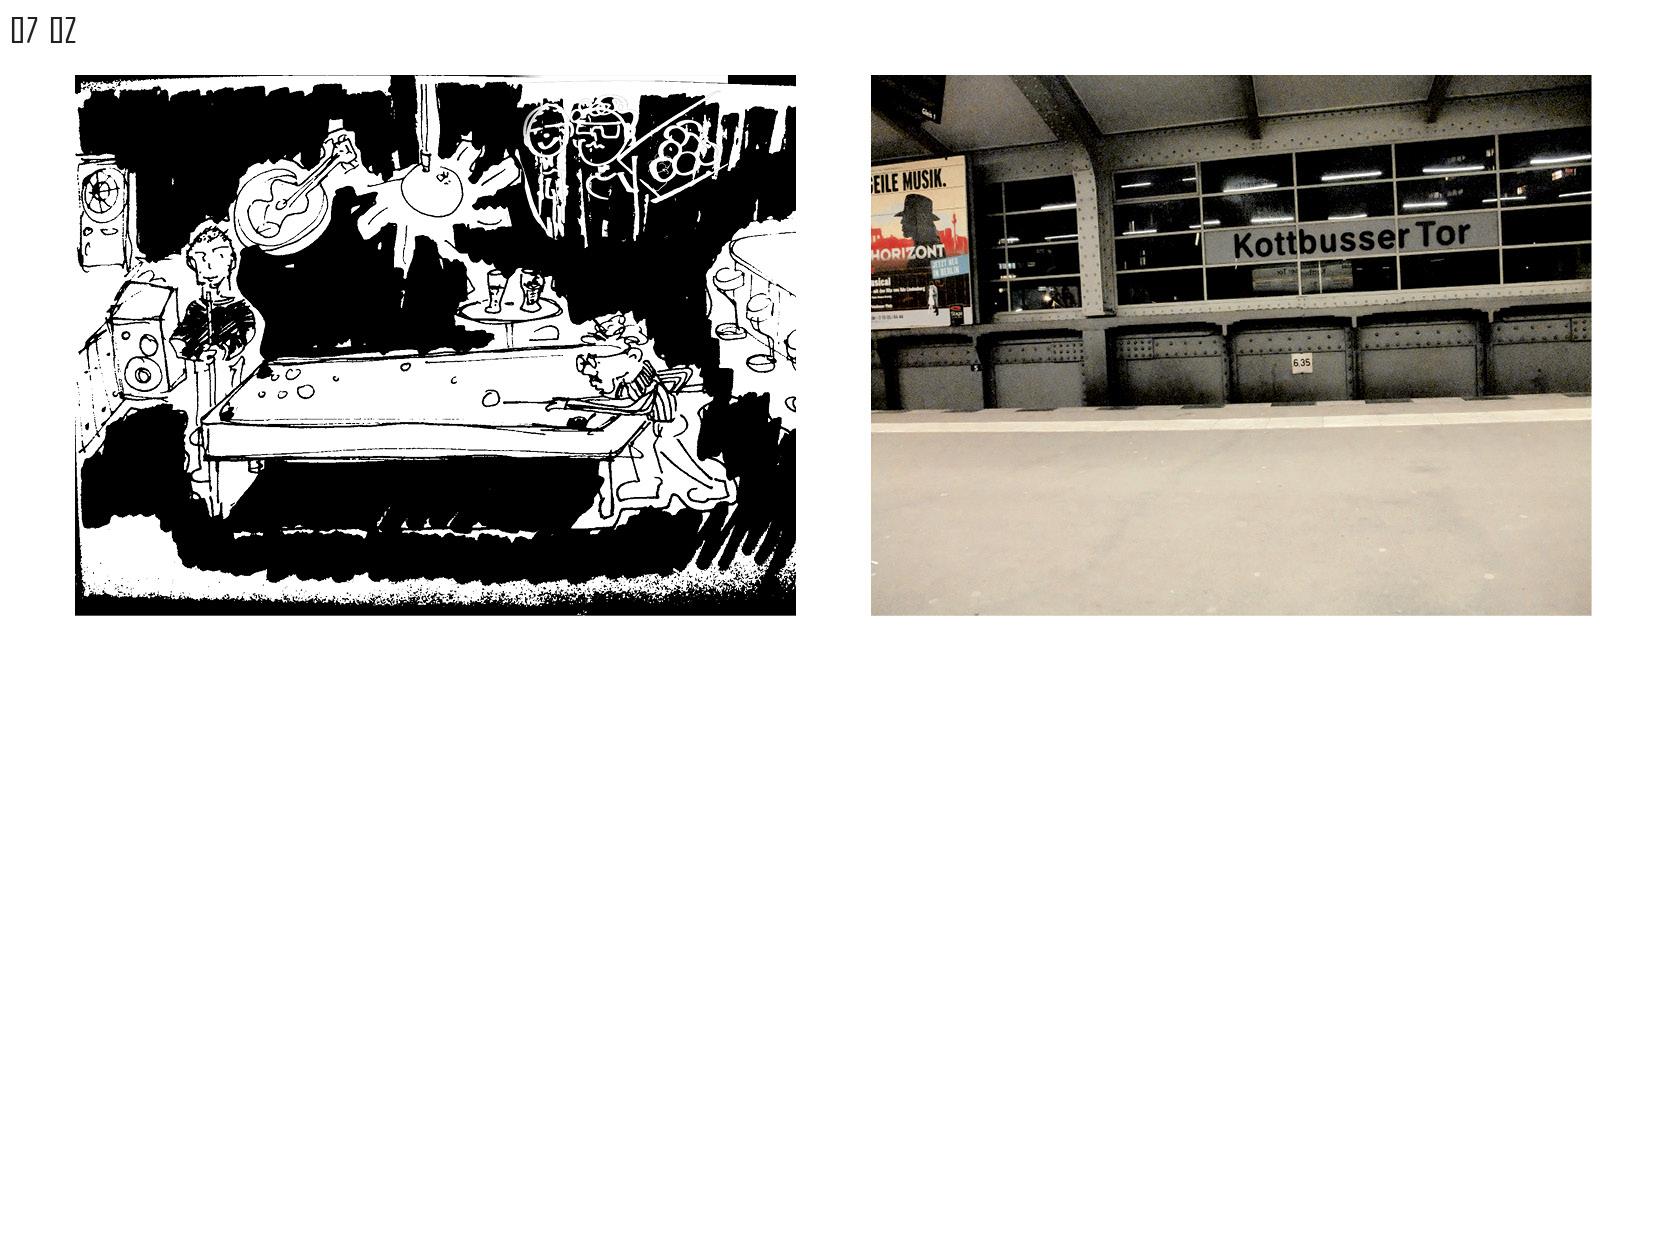 Gerrit-Schweiger-Dialog-Städte-Paris-Berlin-Jessica-Blank-Experiment-Fotoserie-Tagebuch-visuelle-Kommunikation-98